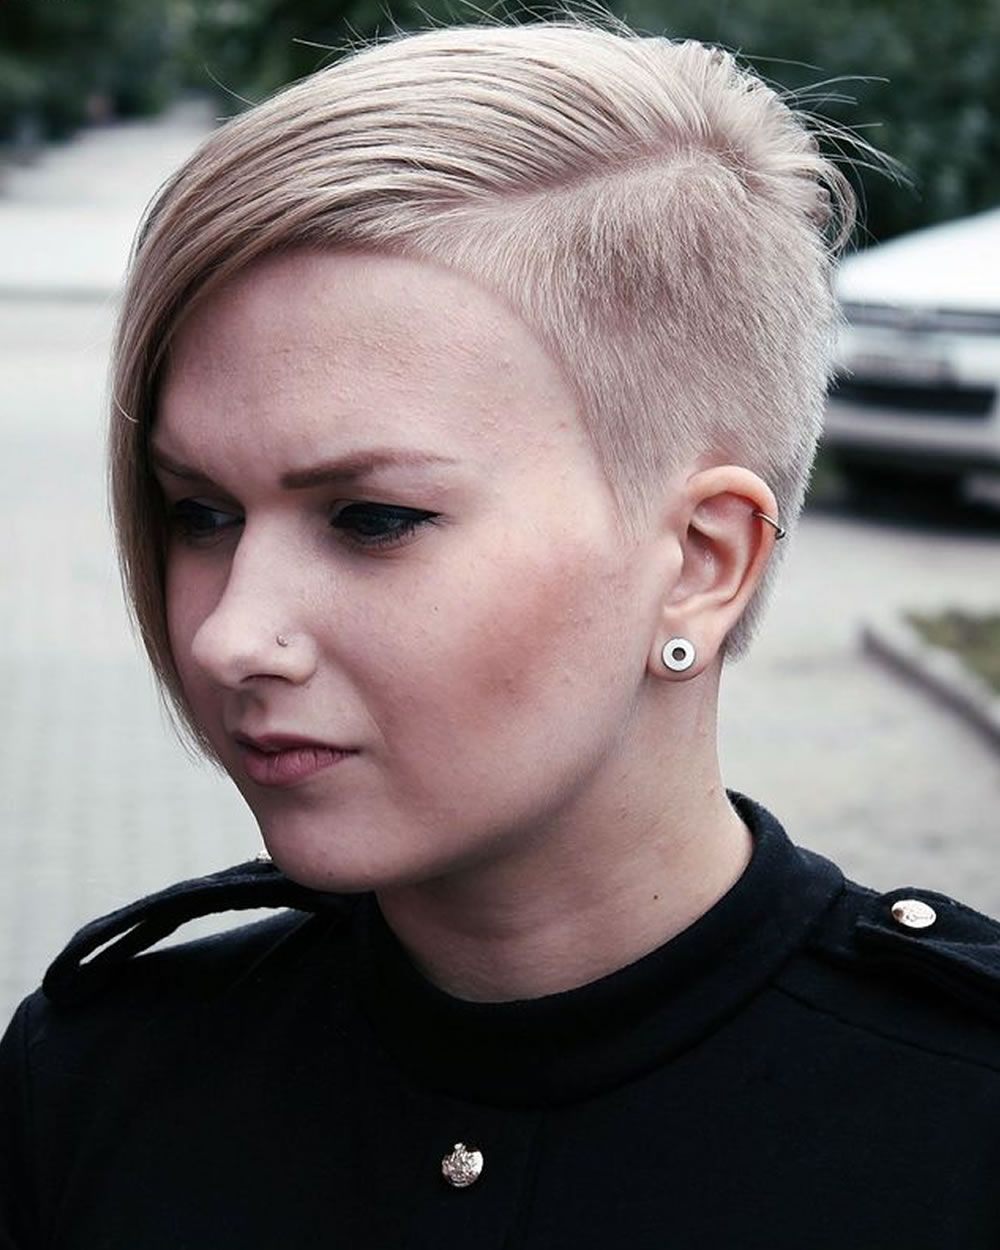 Feminine Extreme Short Haircuts for Women 30-30 | Short ...